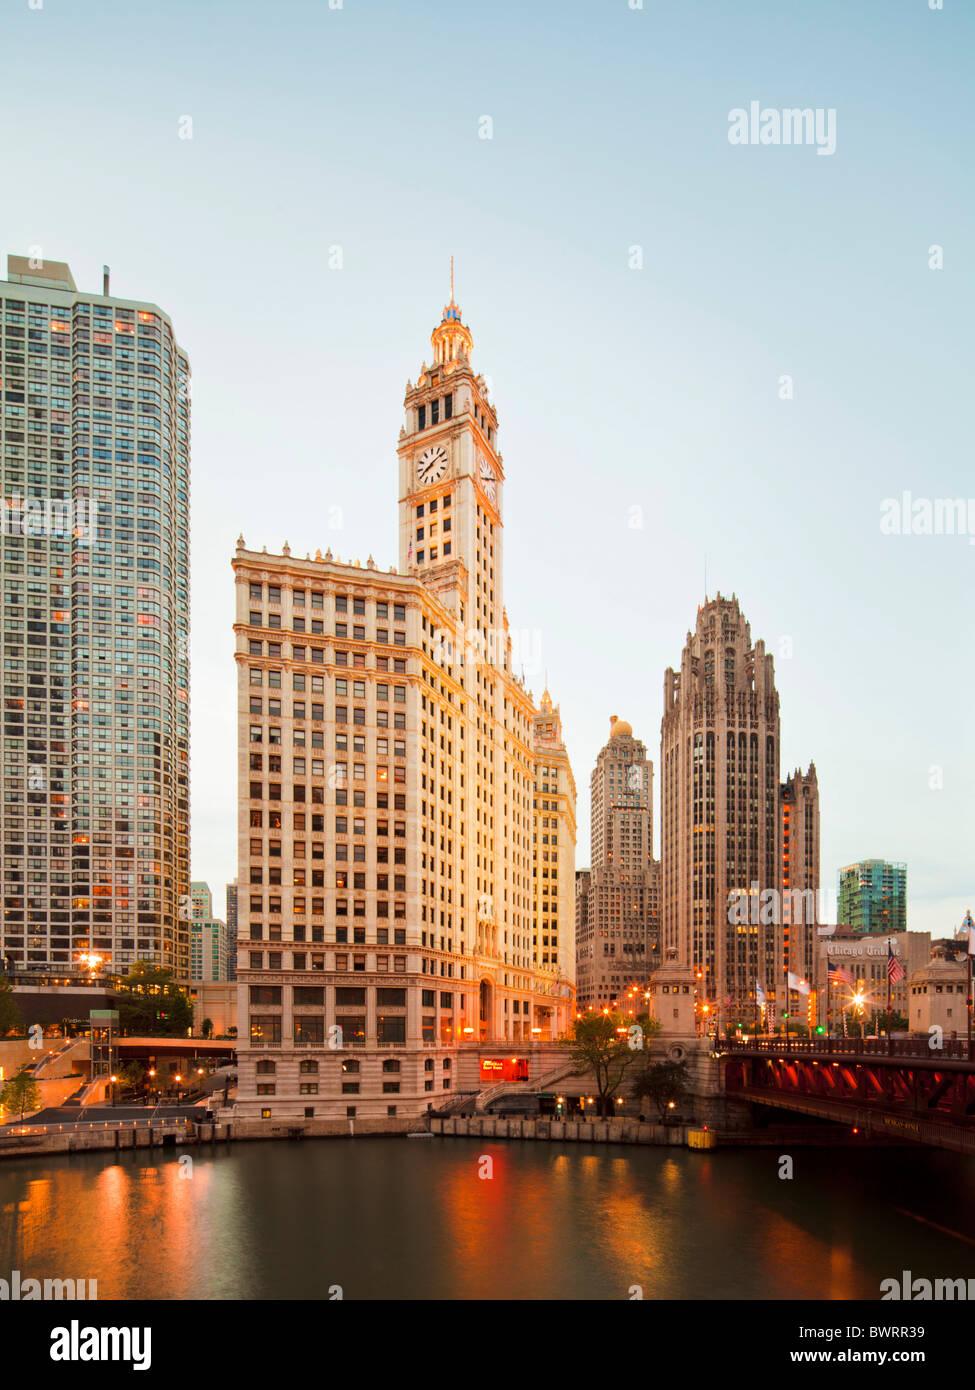 Wrigley Building, Tribune Tower, Chicago river, Illinois - Stock Image